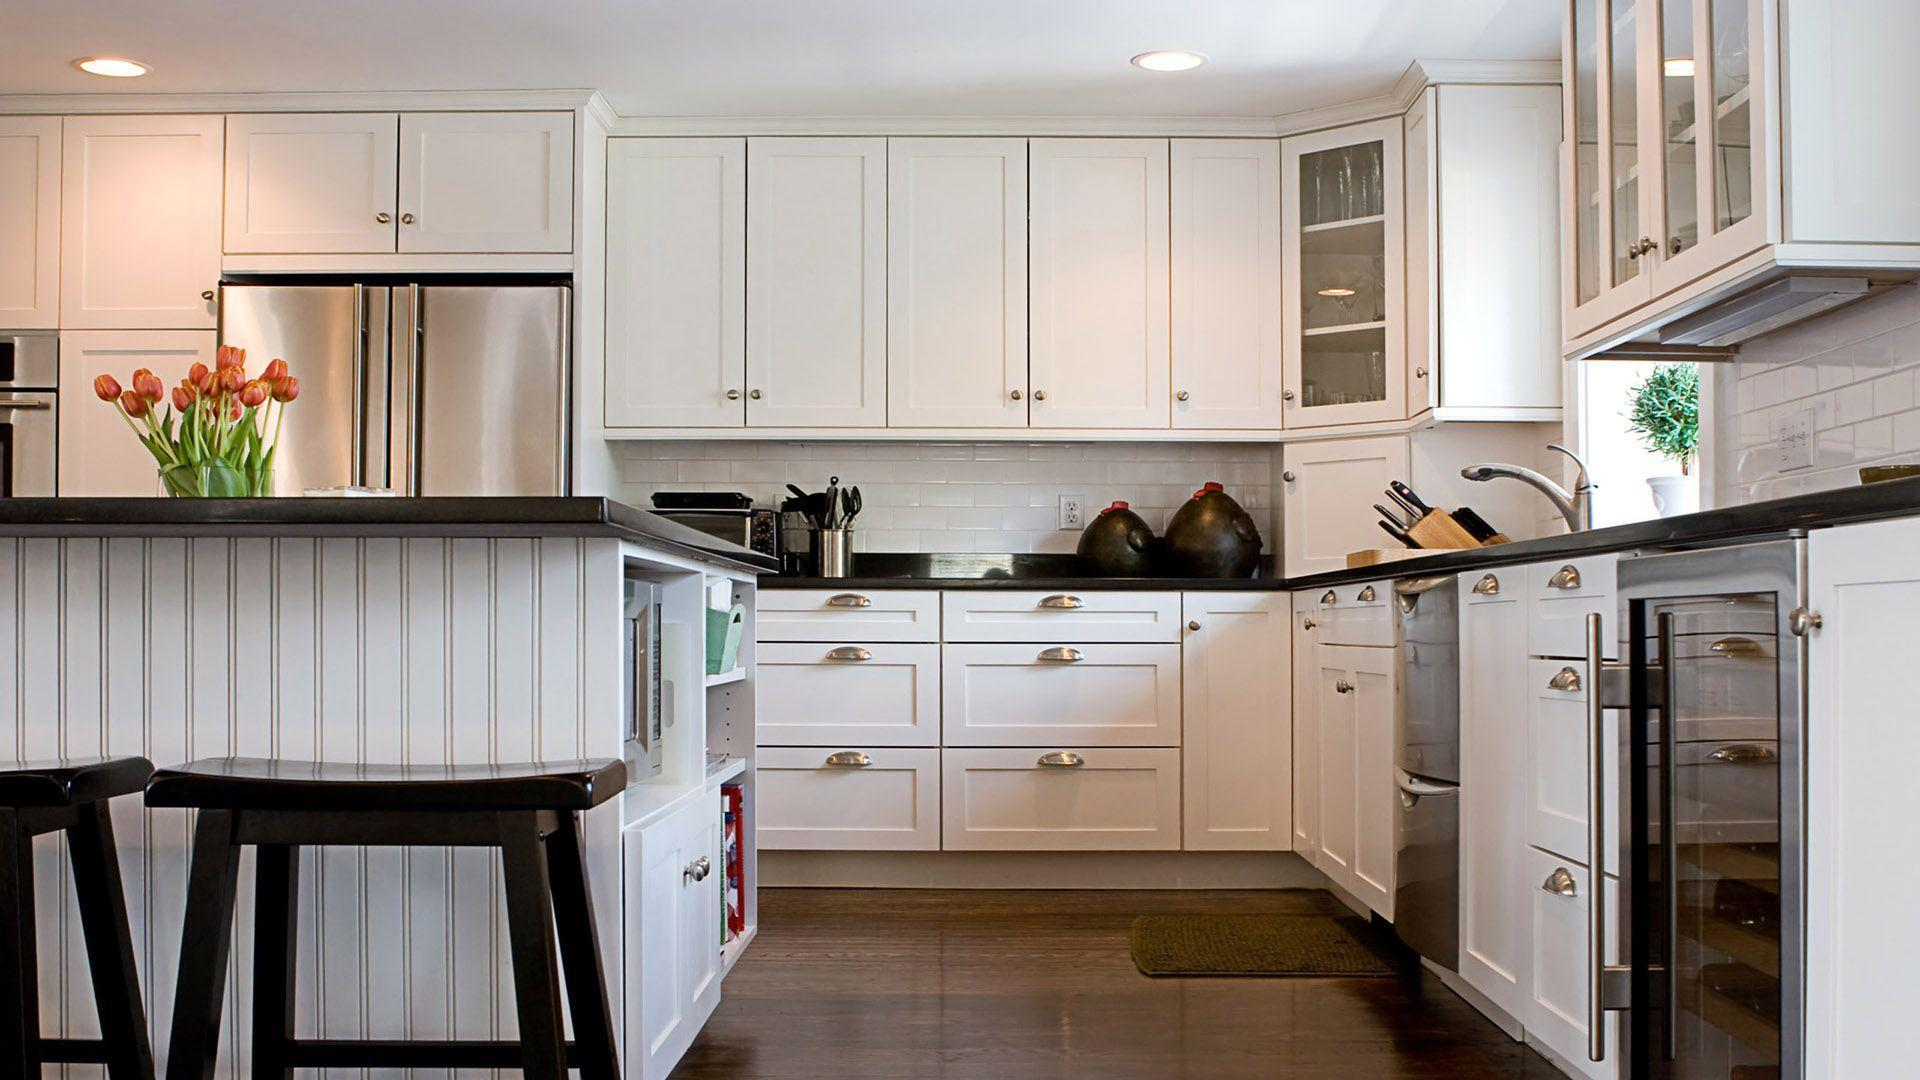 wallpaper designs for kitchens